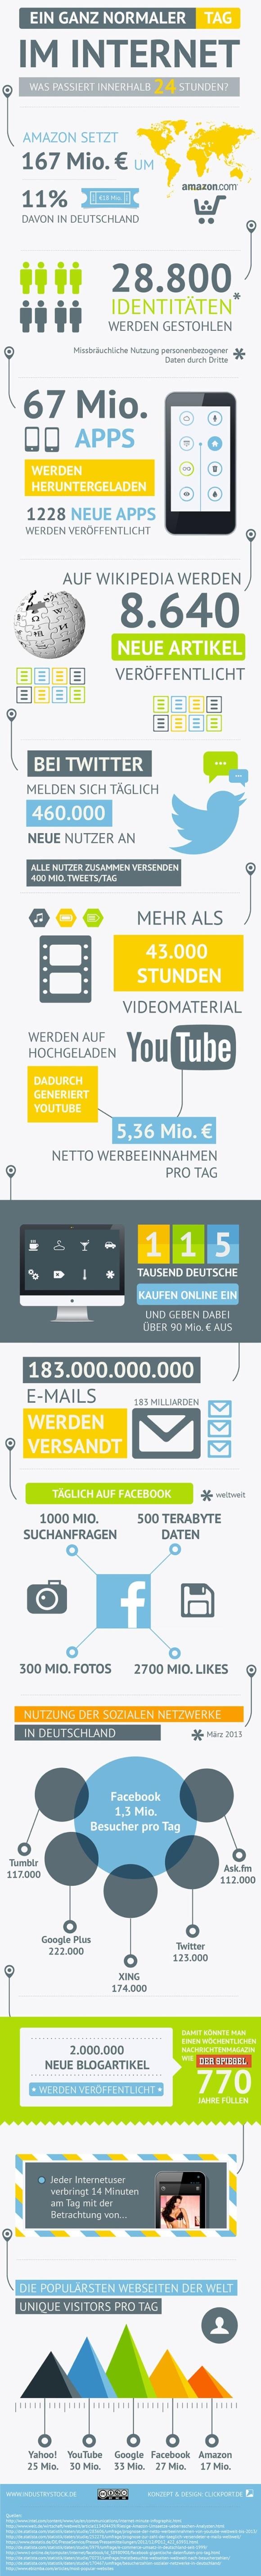 infografik-24h-internet